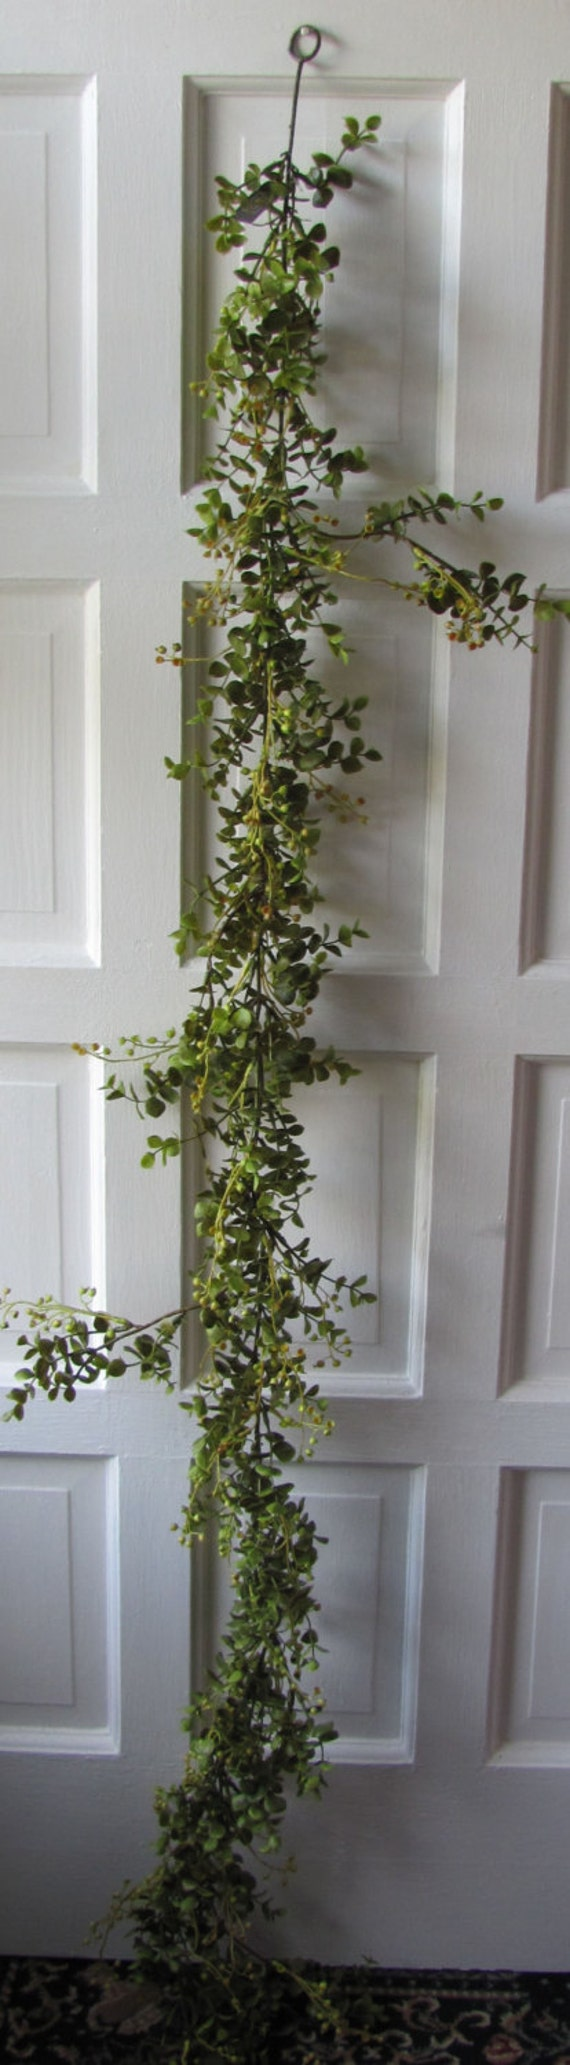 Eucalyptus Wedding  Garland, Wedding Reception Garland, Craft Garland, Artificial Eucalyptus Garlands,DIY Wedding Table Garlands